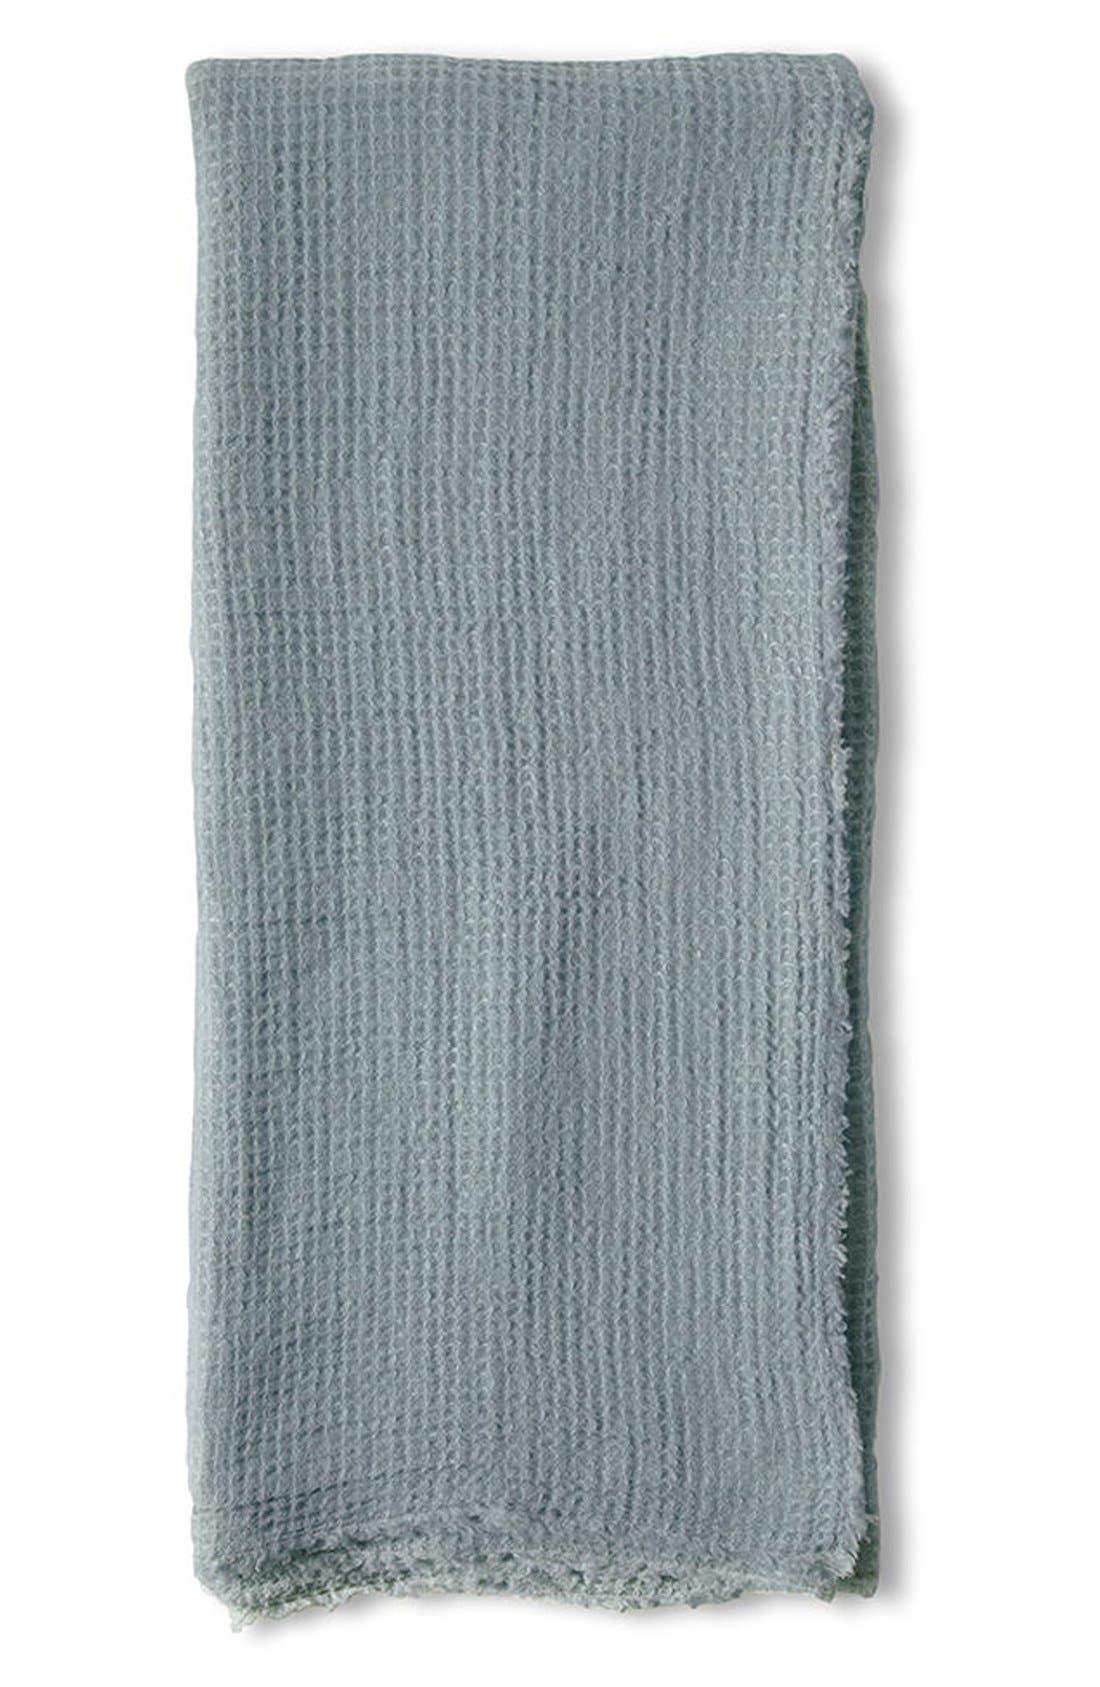 Pom Pom At Home Venice Oversize Throw Blanket